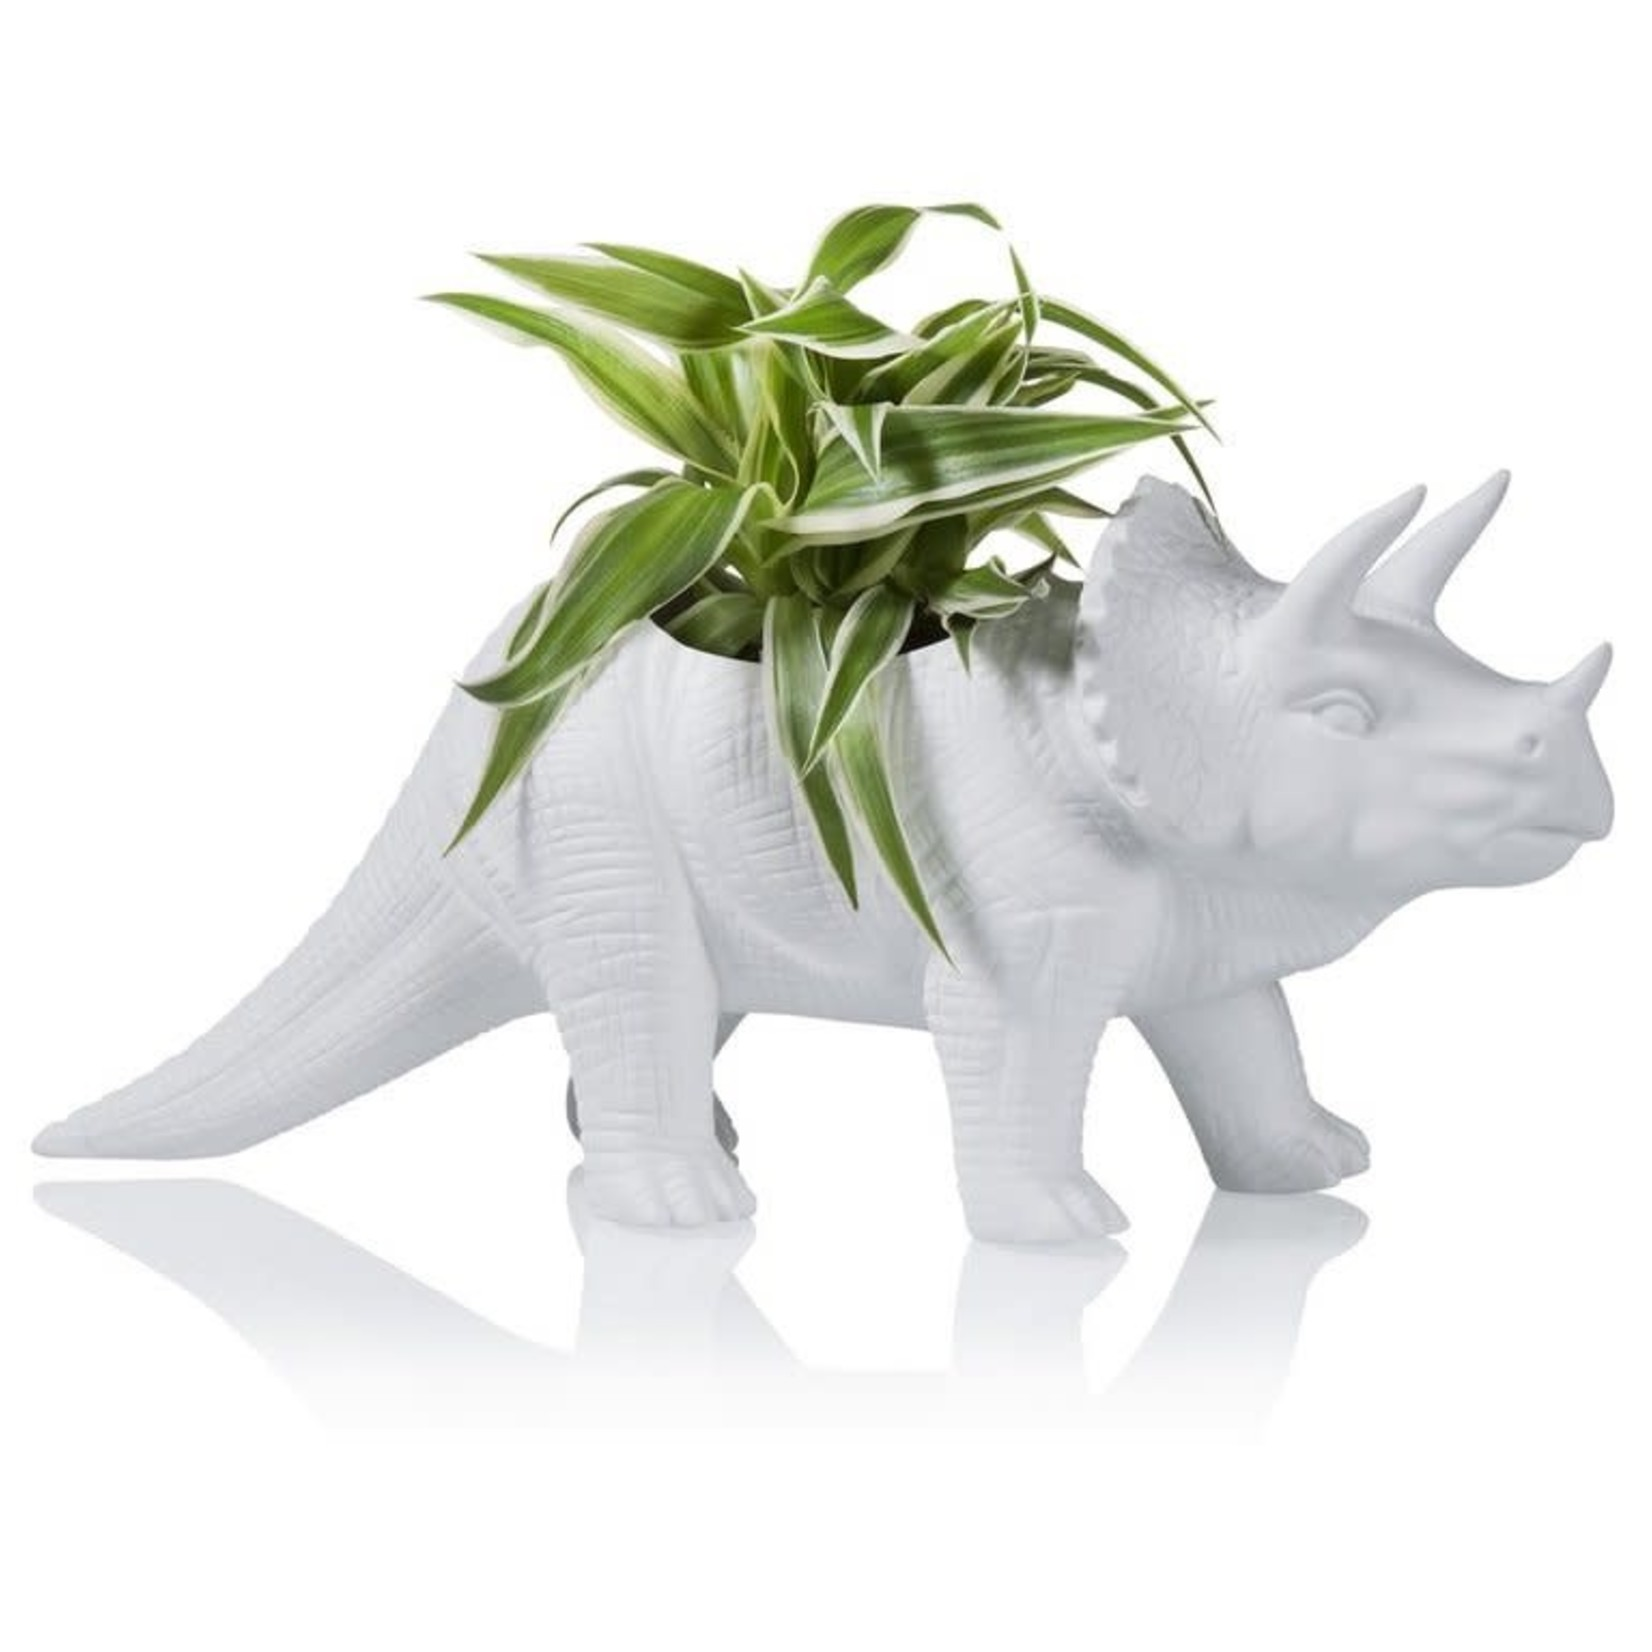 Kikkerland TRICERAPOT porcelain planter